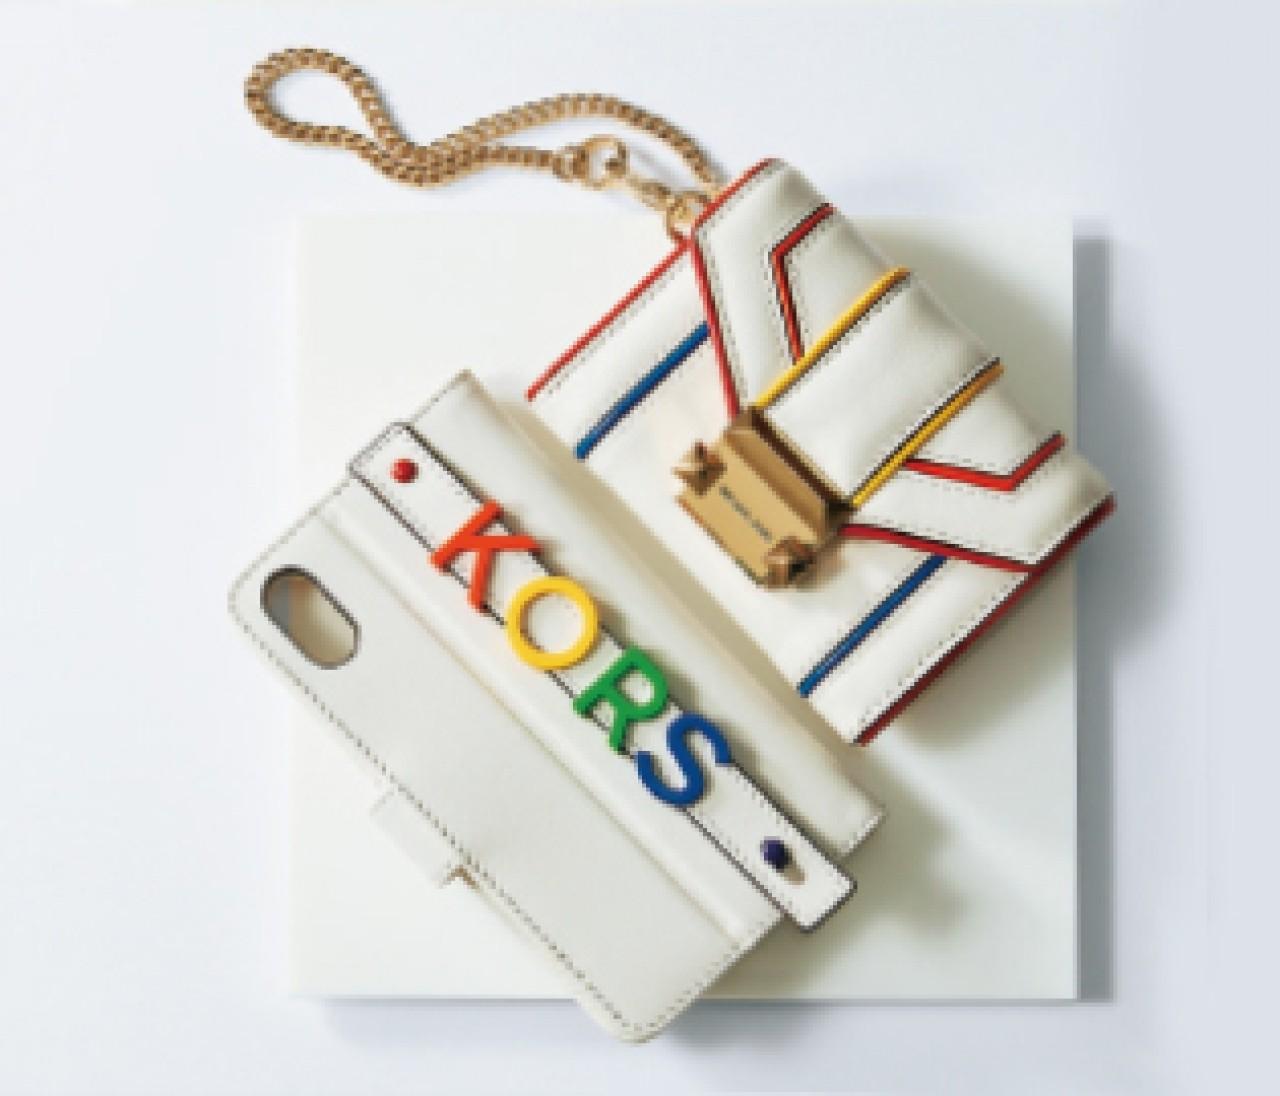 【MICHAEL MICHAEL KORS】キャッチーなデザインでわくわく感を! スモールレザーグッズ⑫